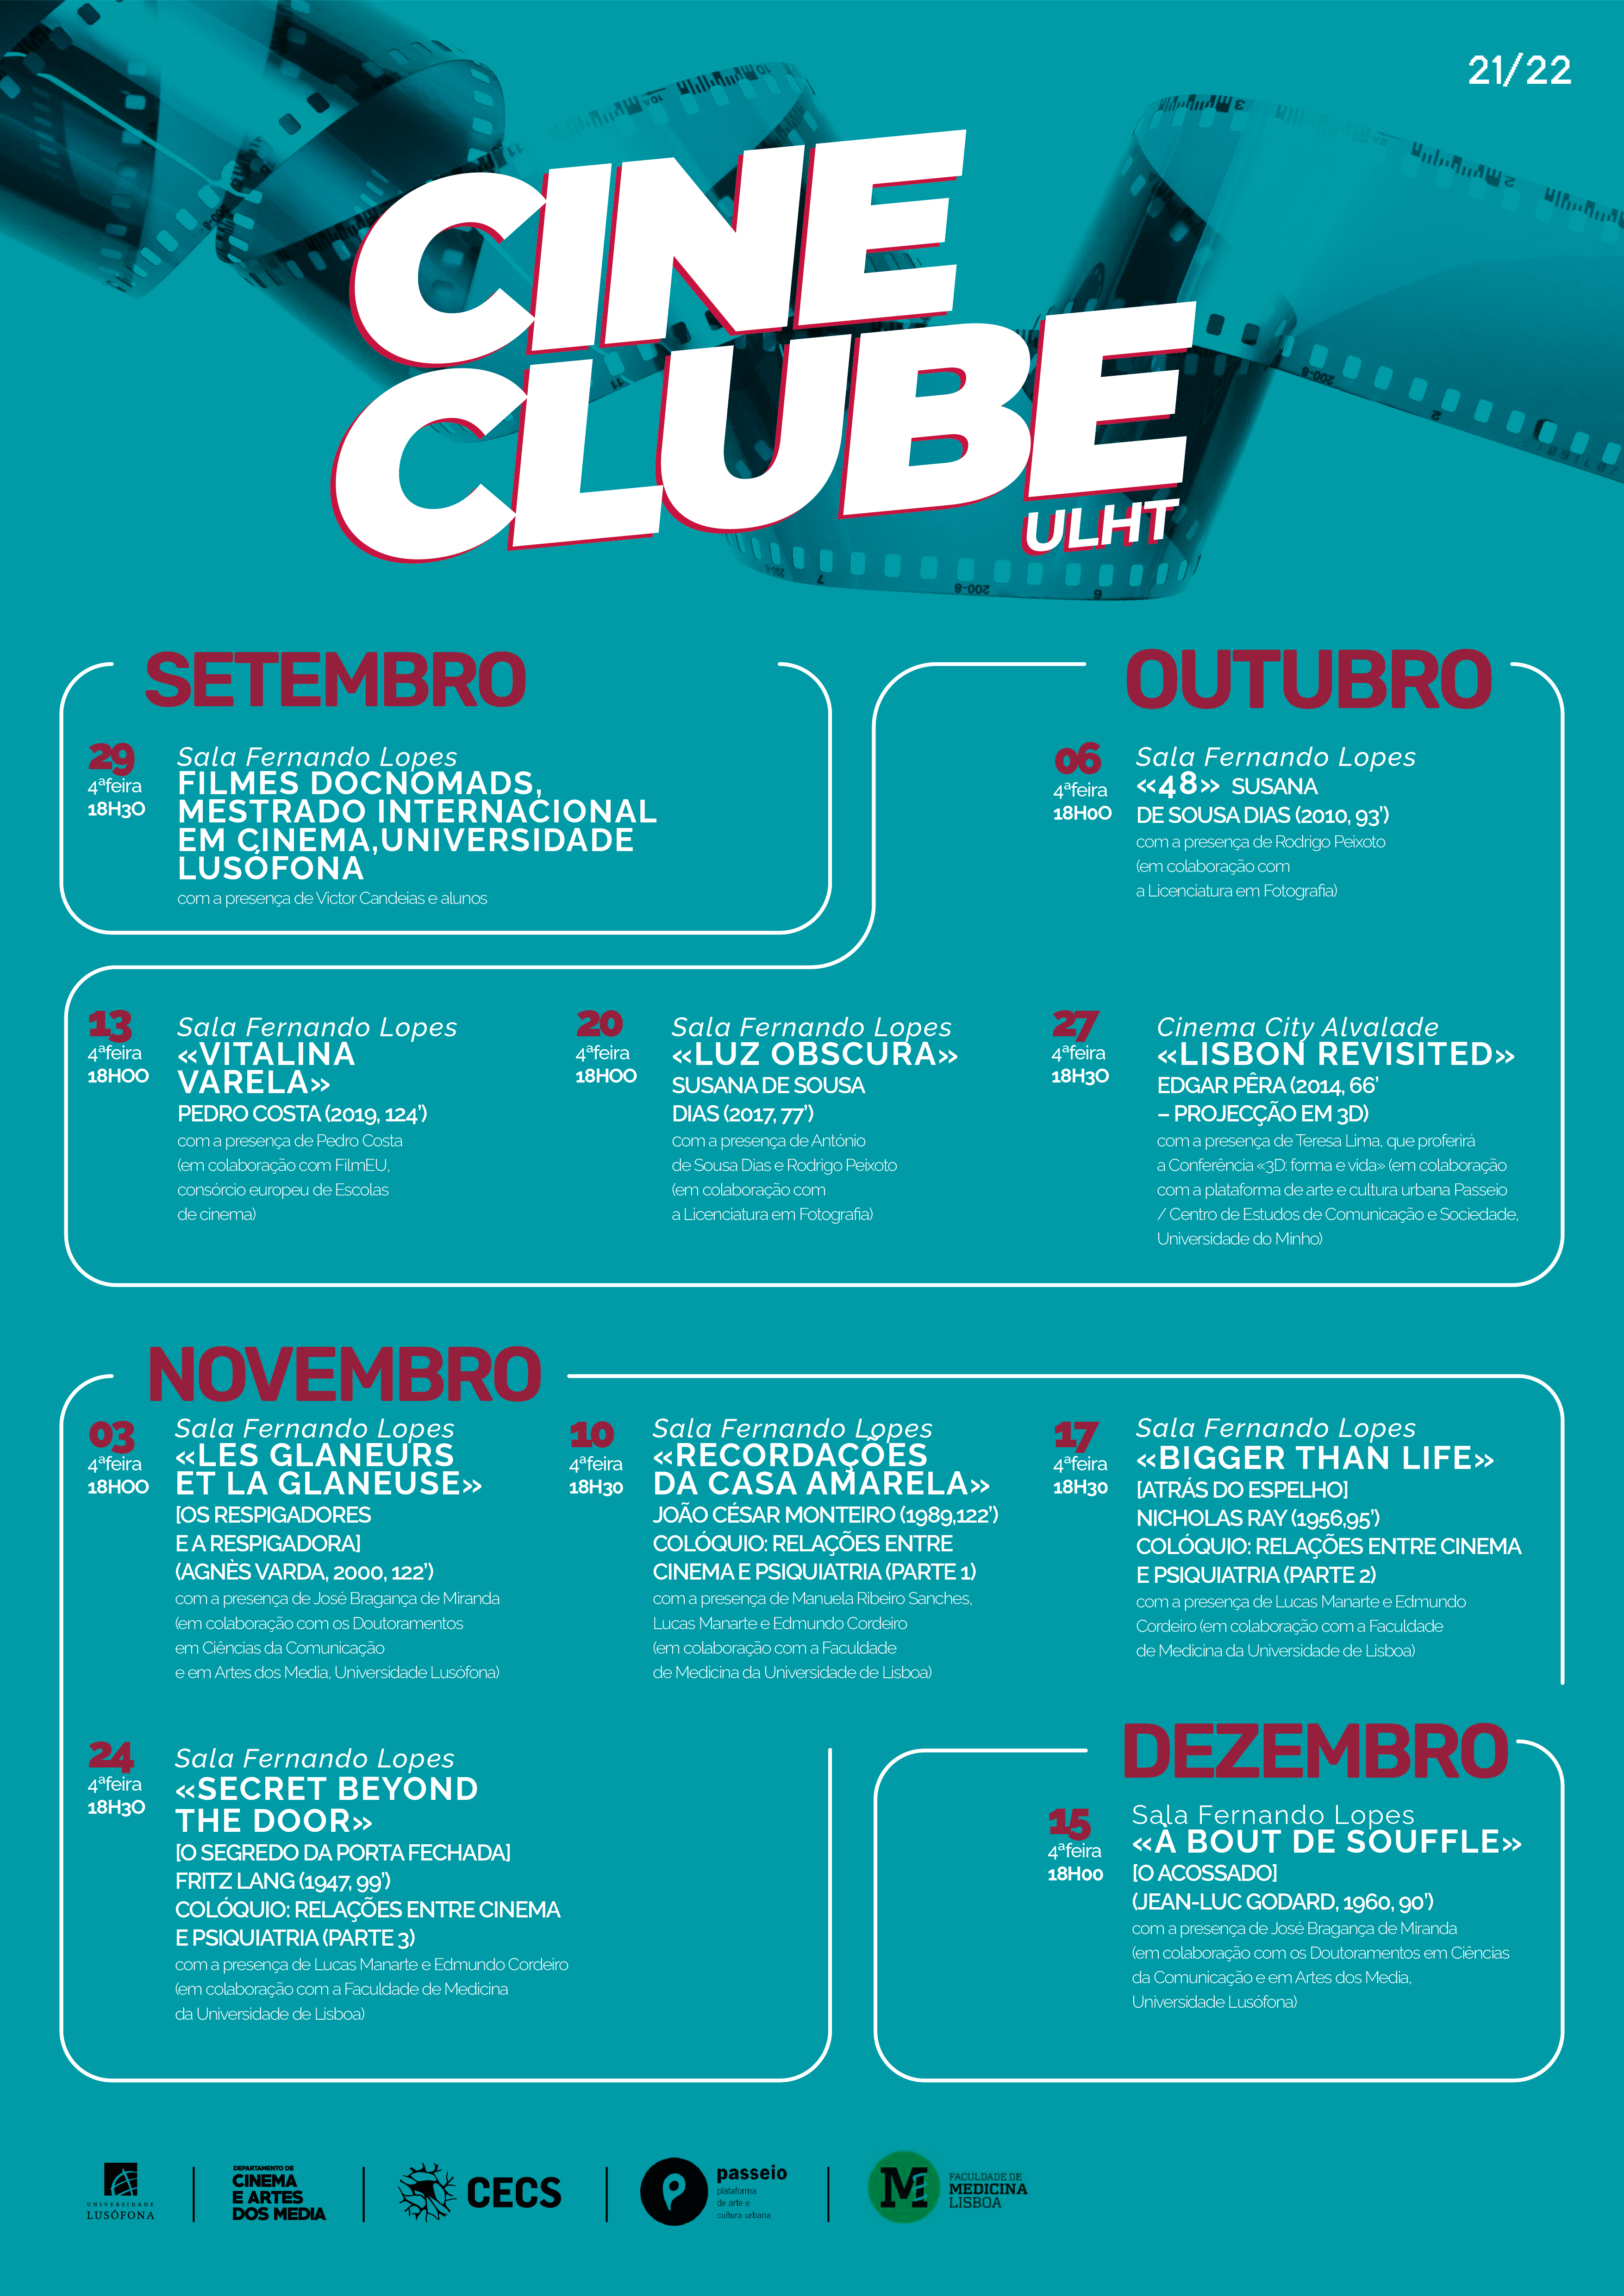 <h4>Programa cineclube</h4><p></p>